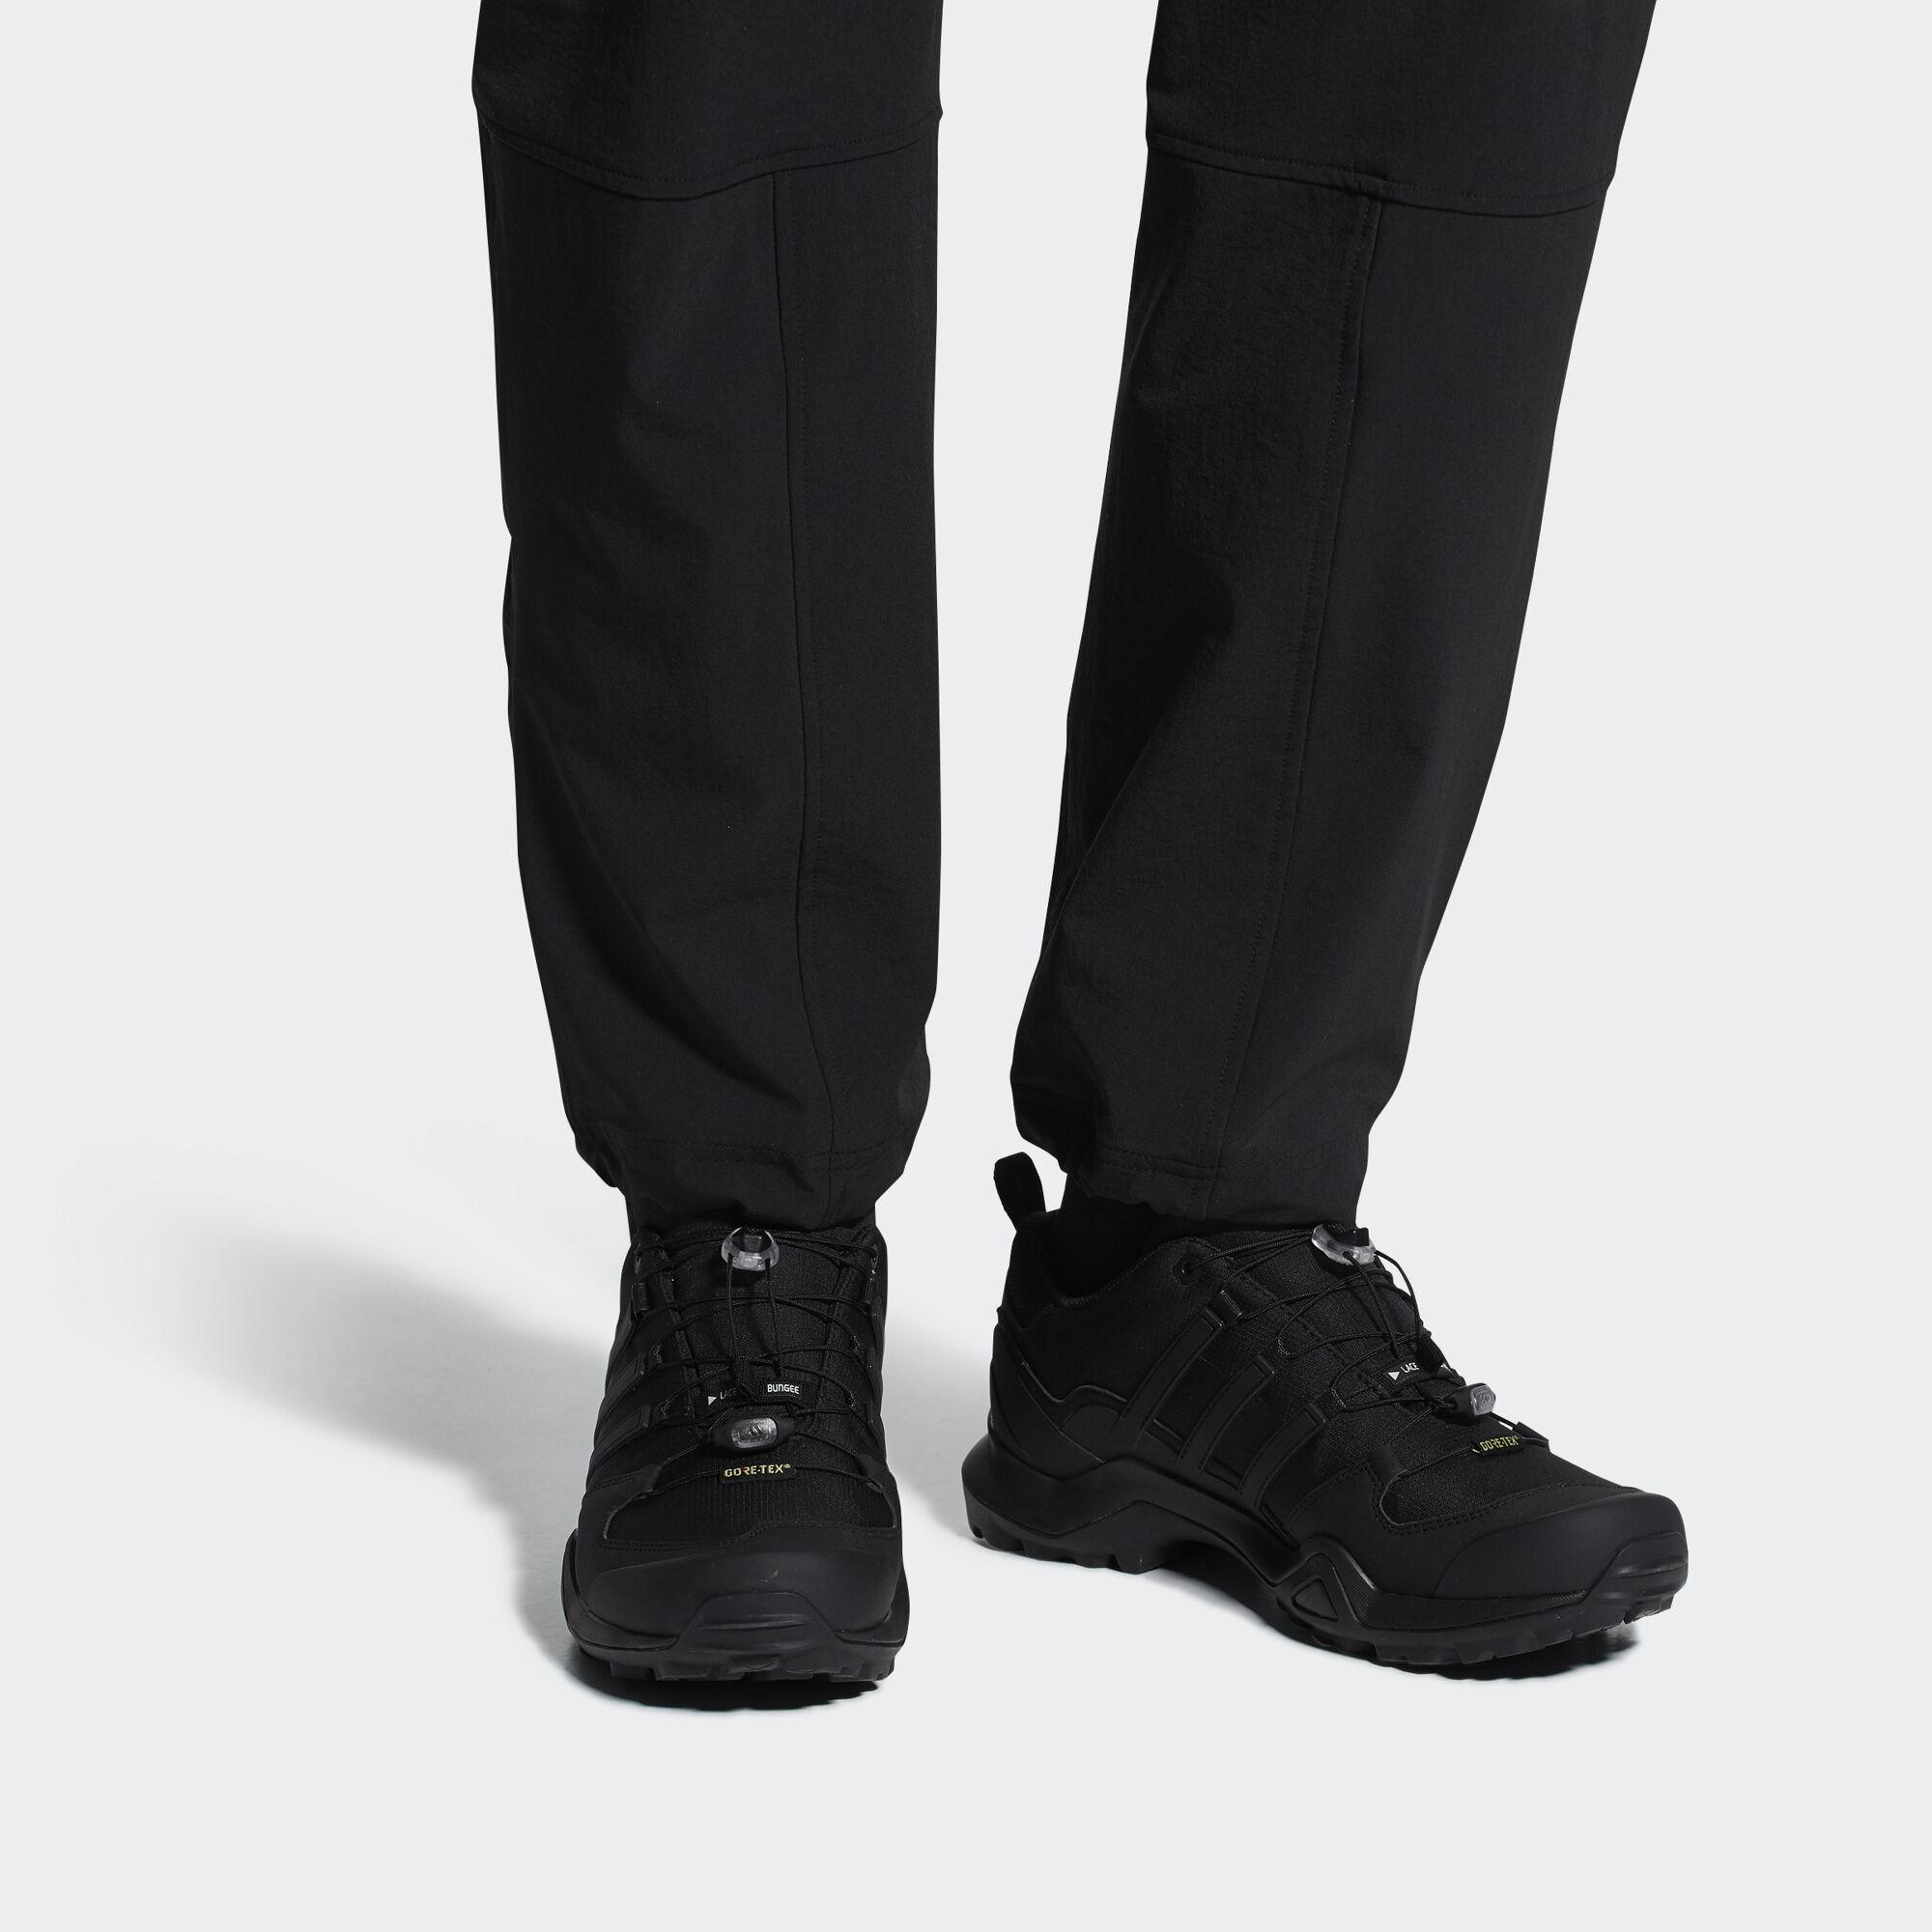 wholesale dealer 489bc 2e002 adidas Terrex Swift R2 GTX Shoes - Grey  adidas UK